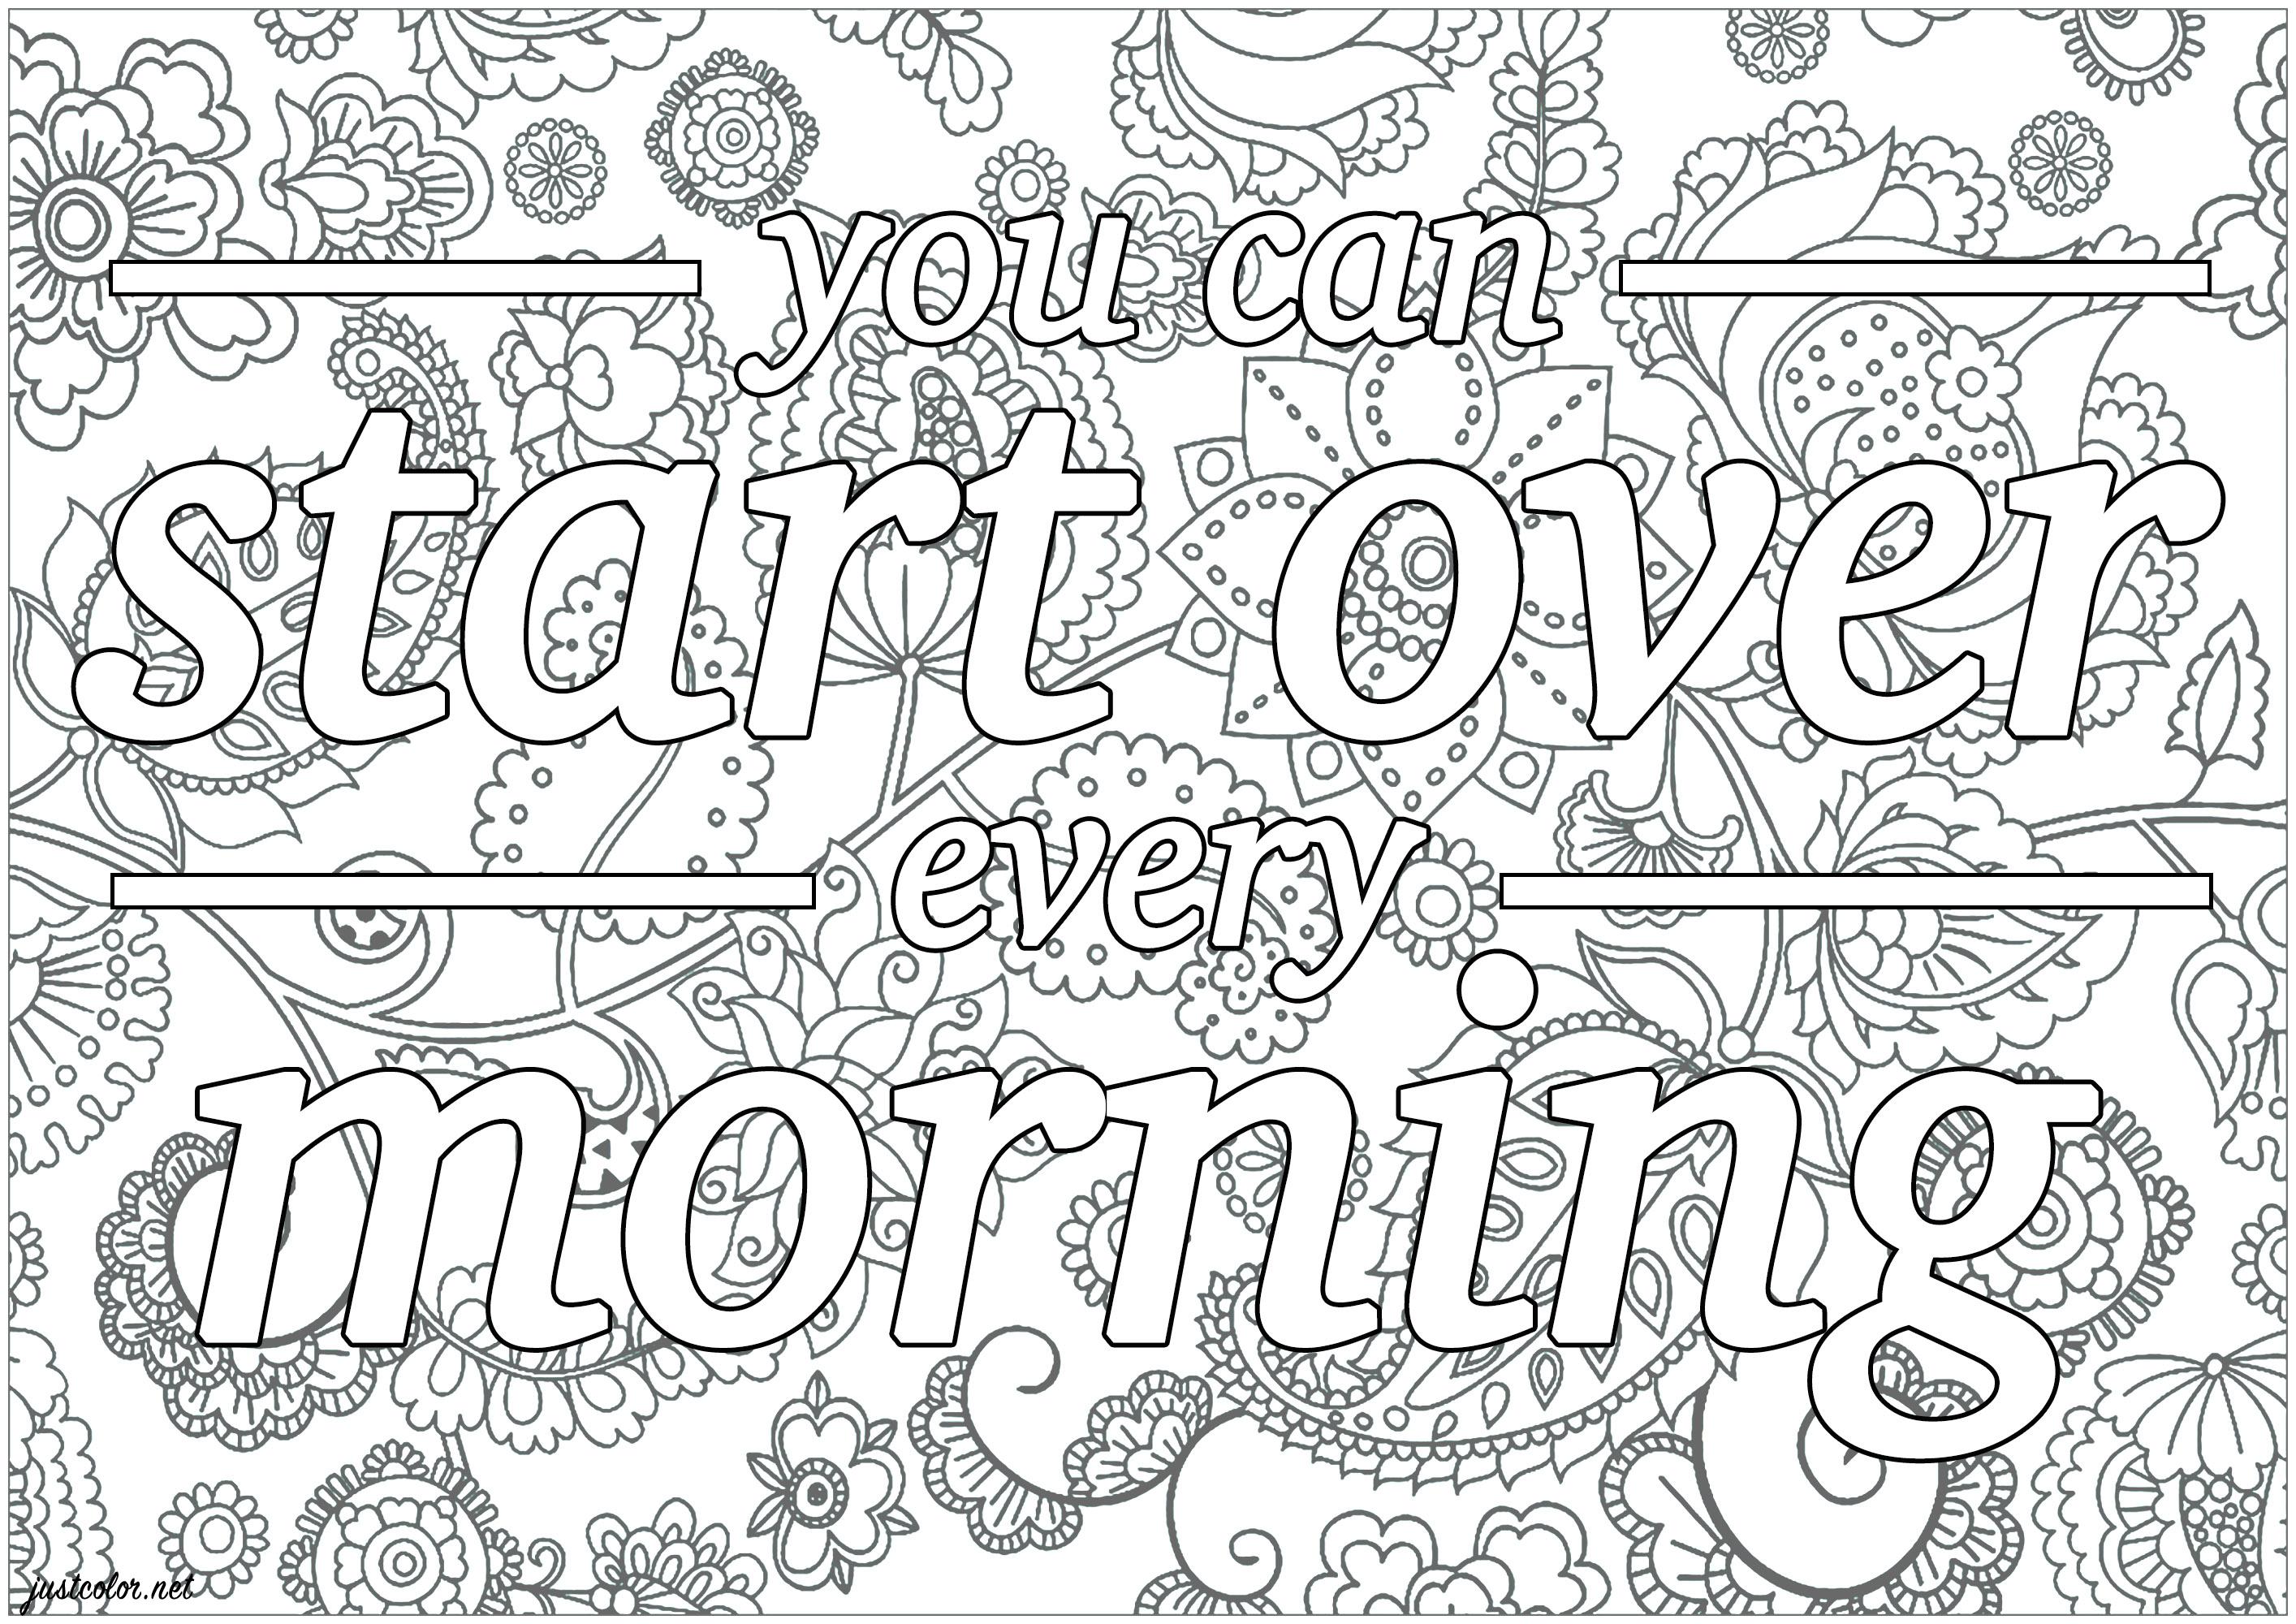 You can start over every morning - Tyler Joseph